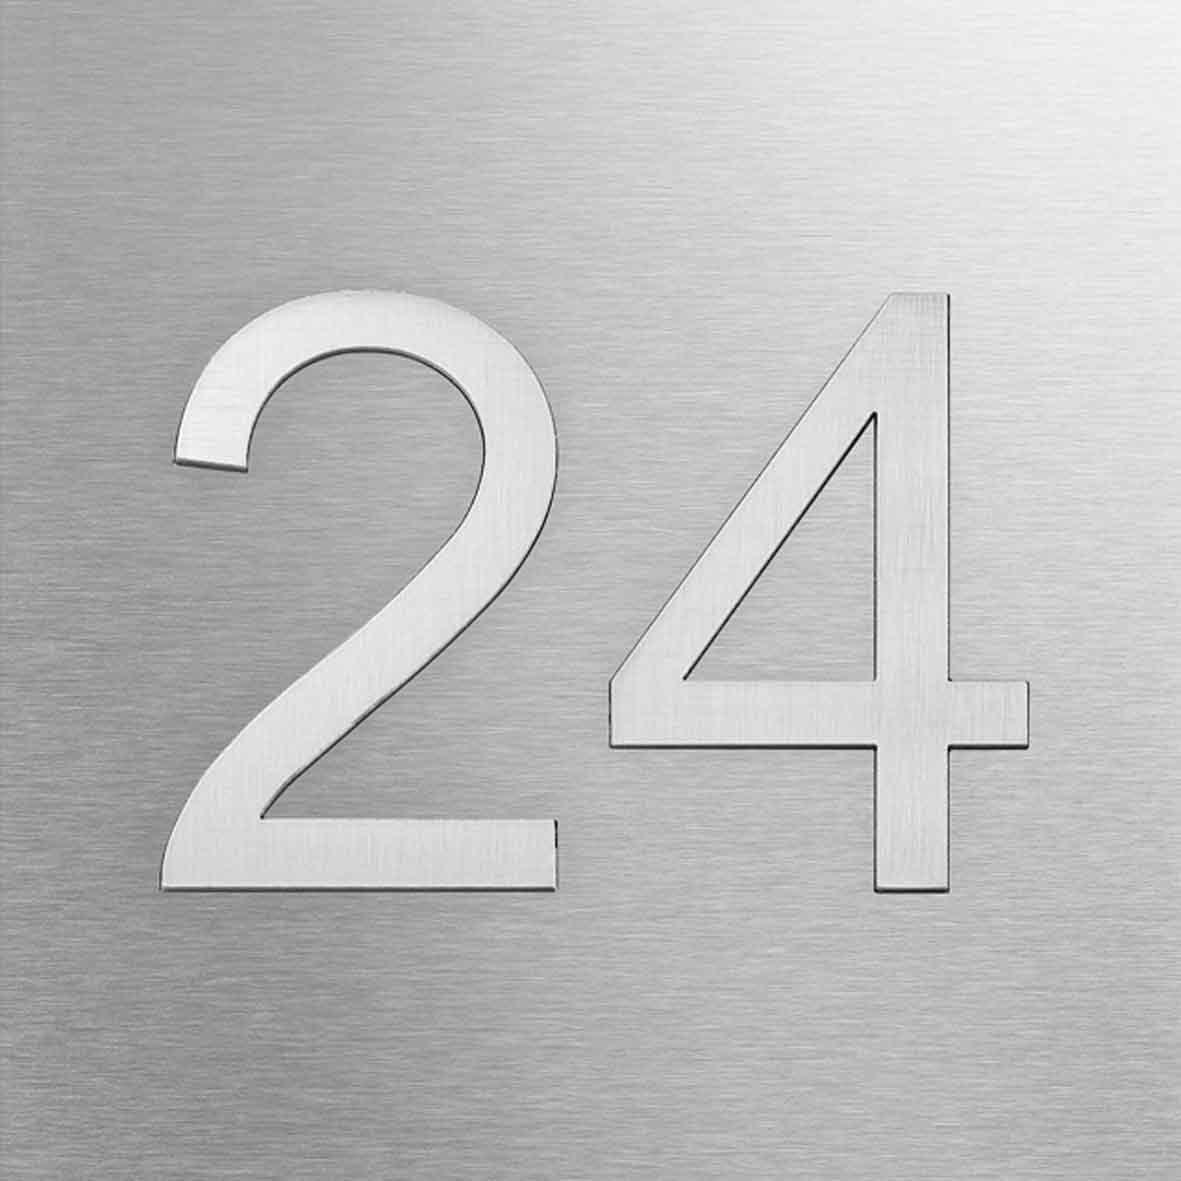 Elcom casa-módulo HNM-120 2-dígitos MODESTA función módulo de puerta 4250111848688: Amazon.es: Electrónica